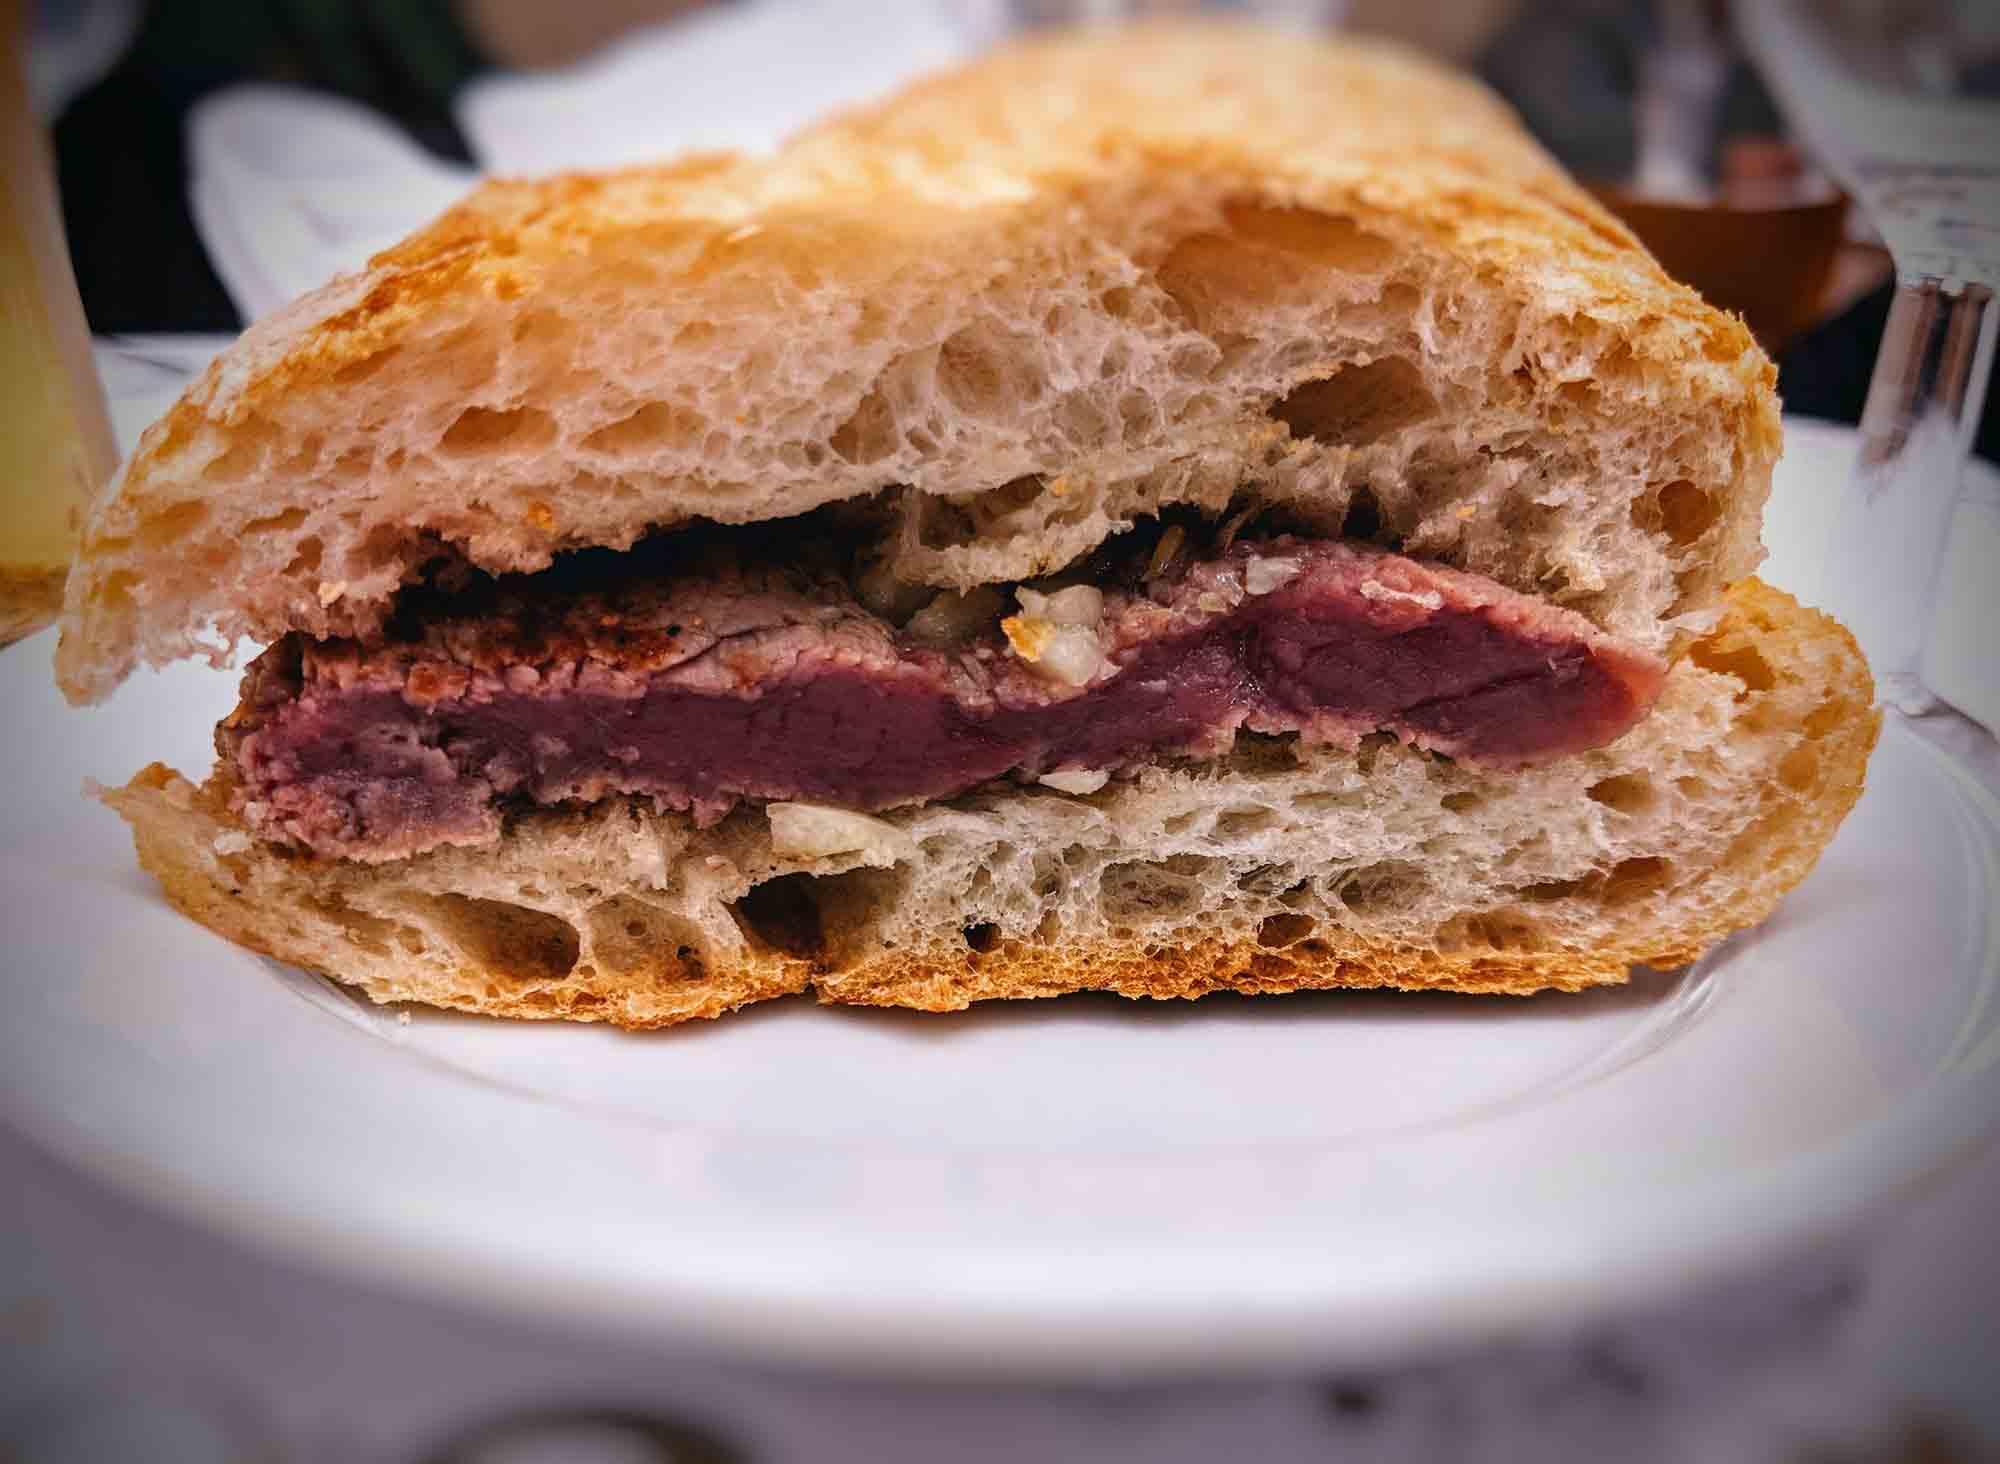 Prego sandwich